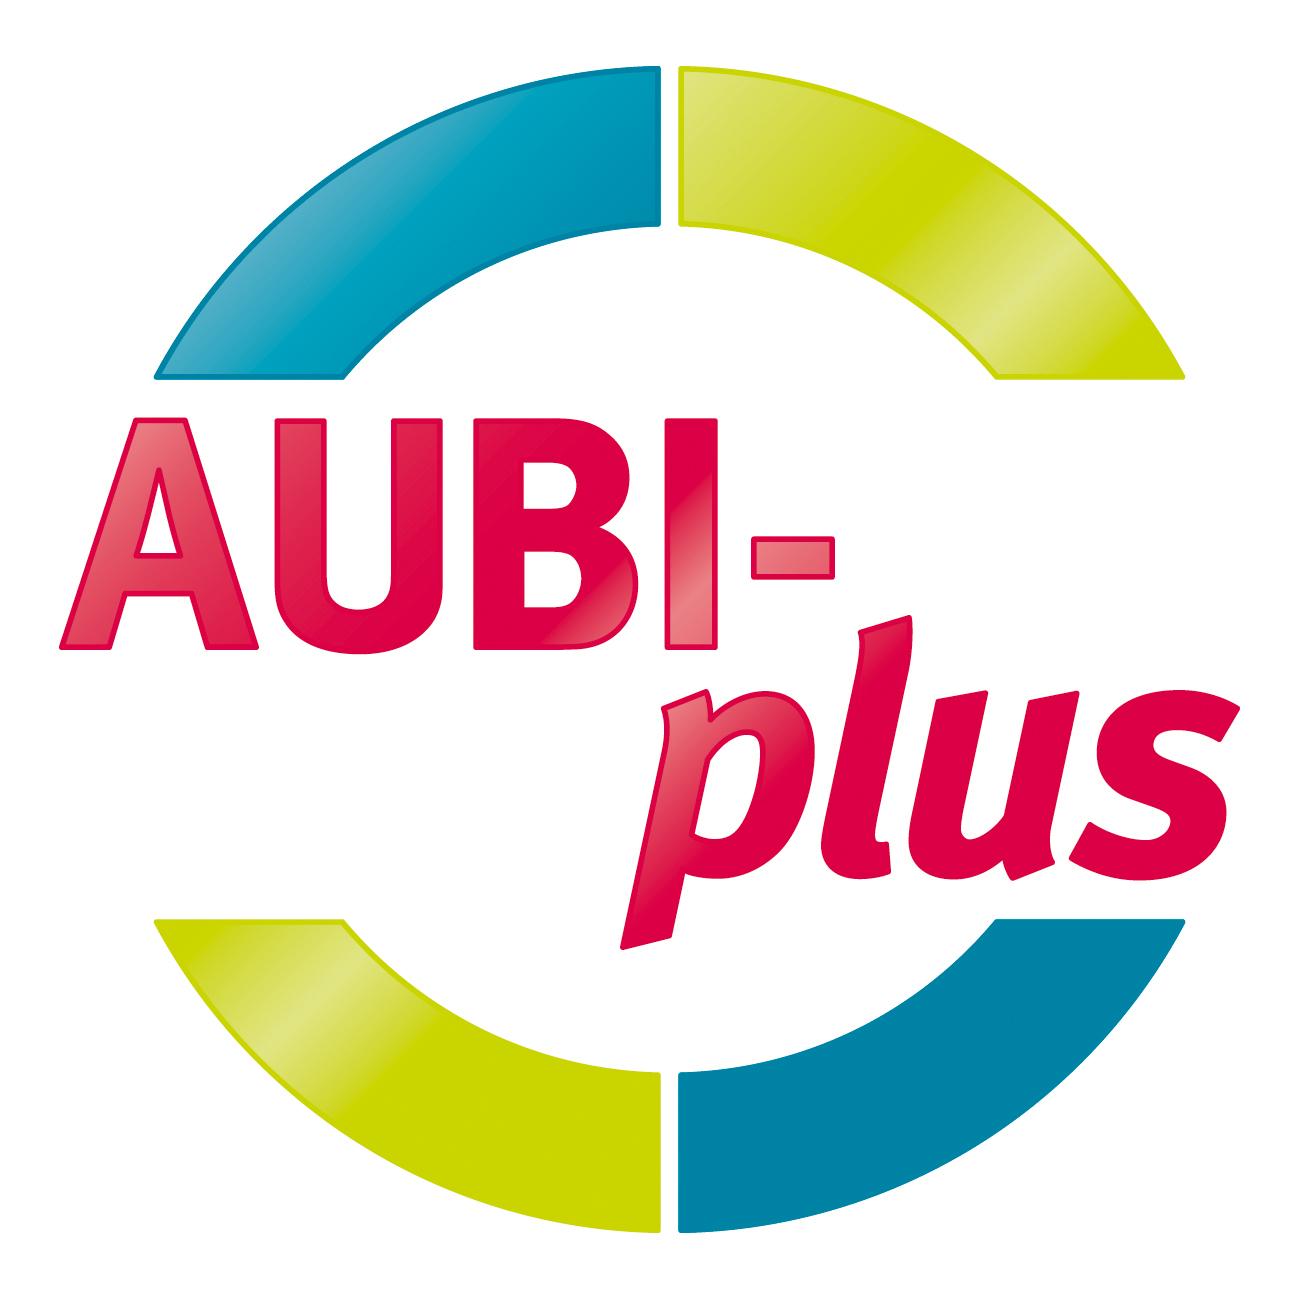 messedaten_messe_206_weblogos_aubiplus_gmbh.jpg